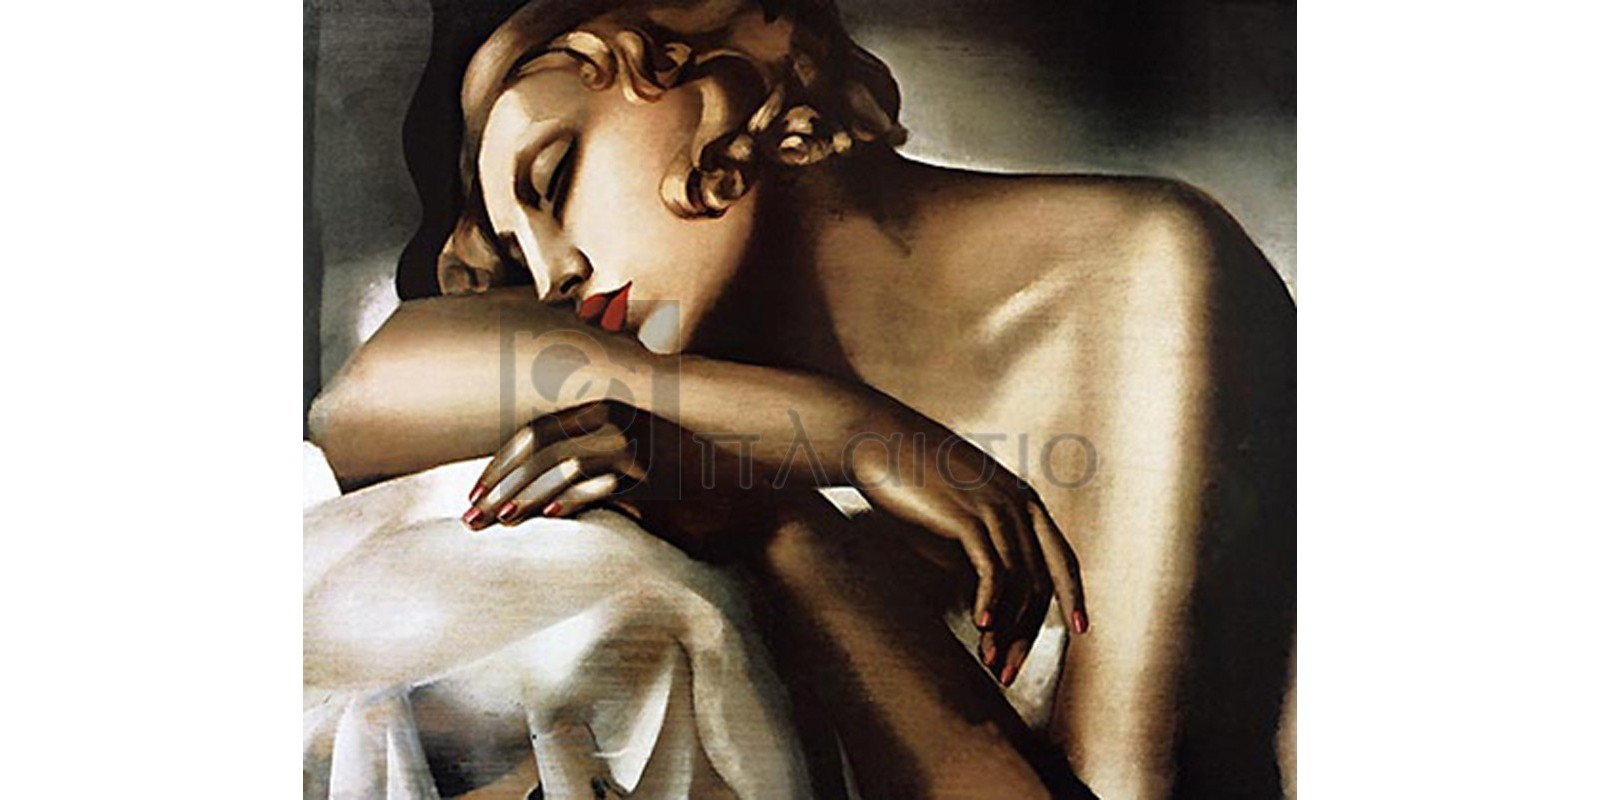 Tamara de Lempicka - Dormeuse, 1931-32